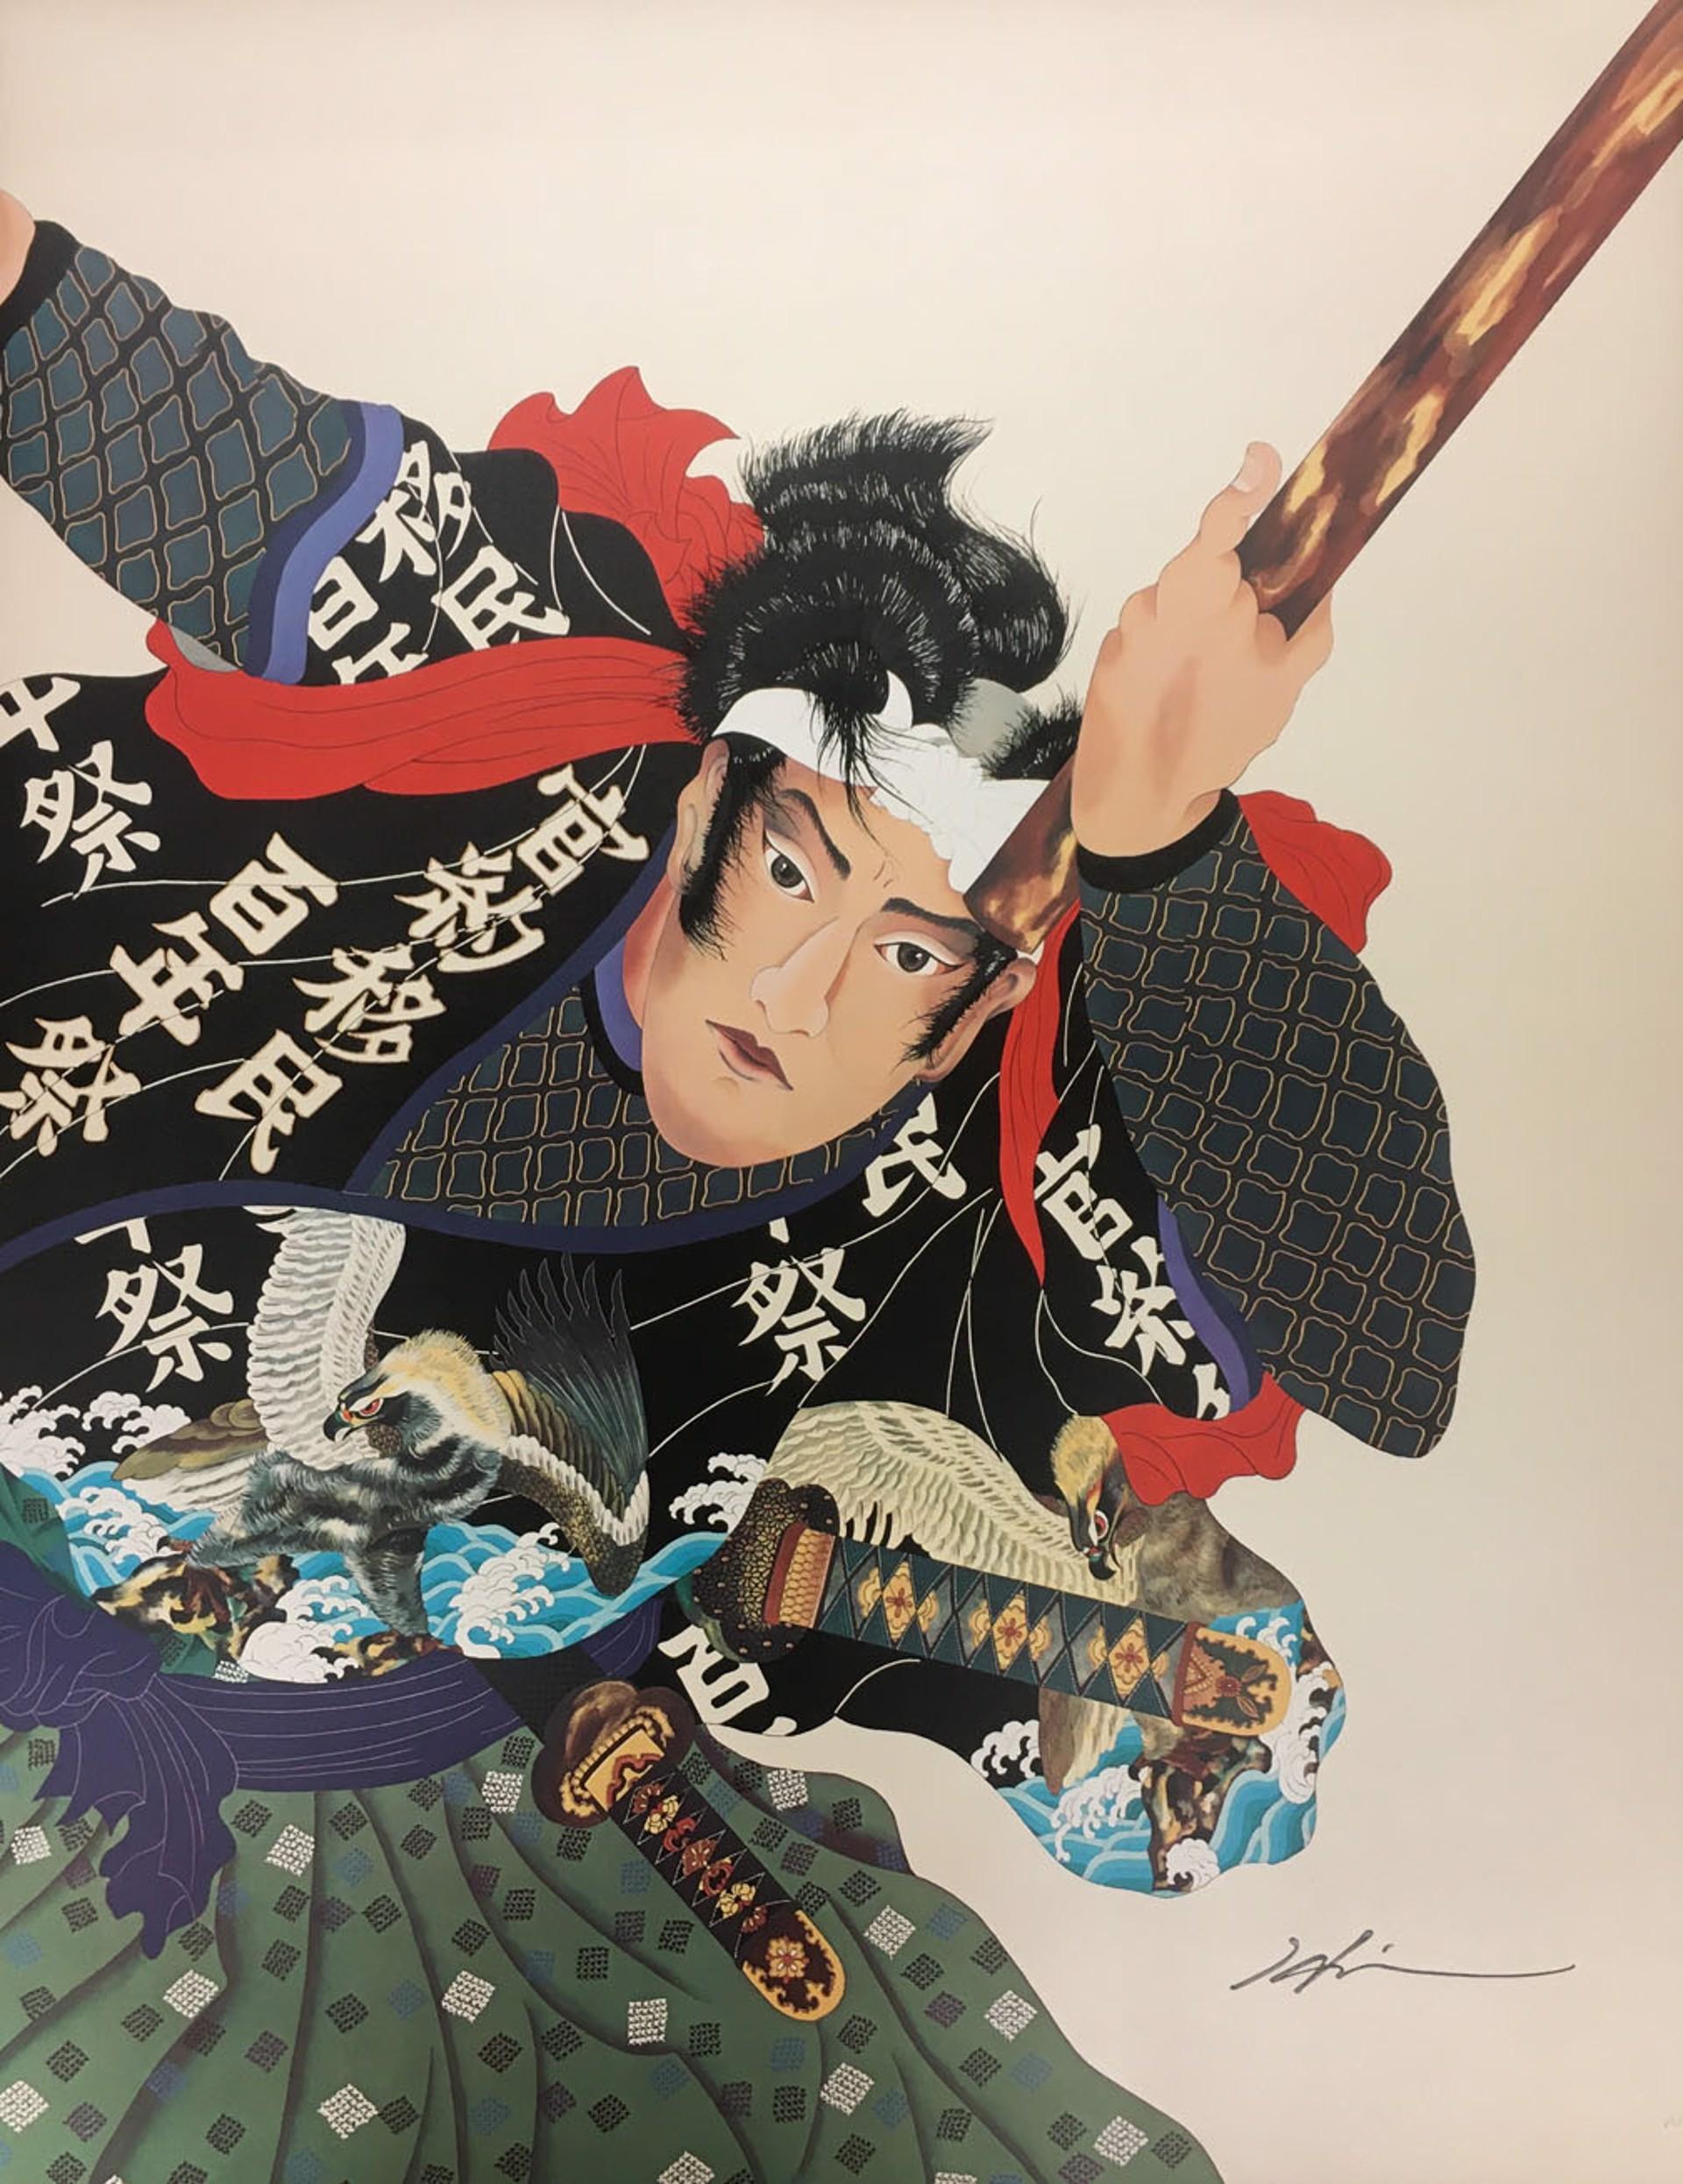 Spirit Of Musashi by Hisashi Otsuka